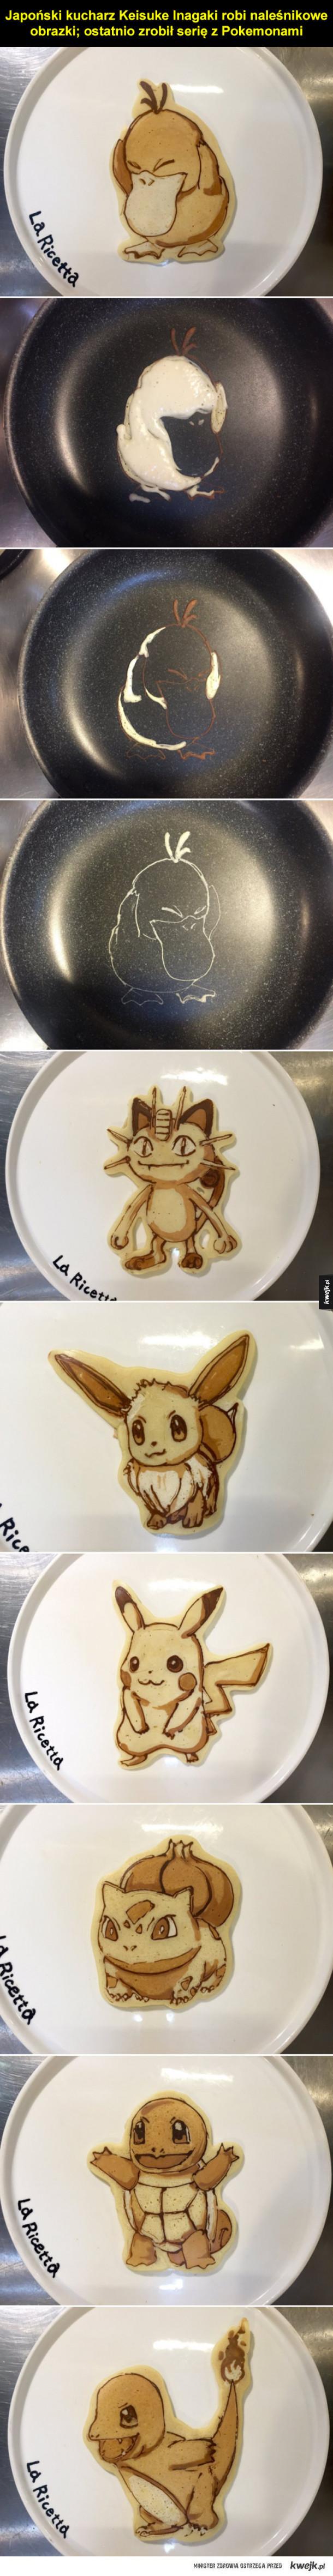 Pokemonowe naleśniki